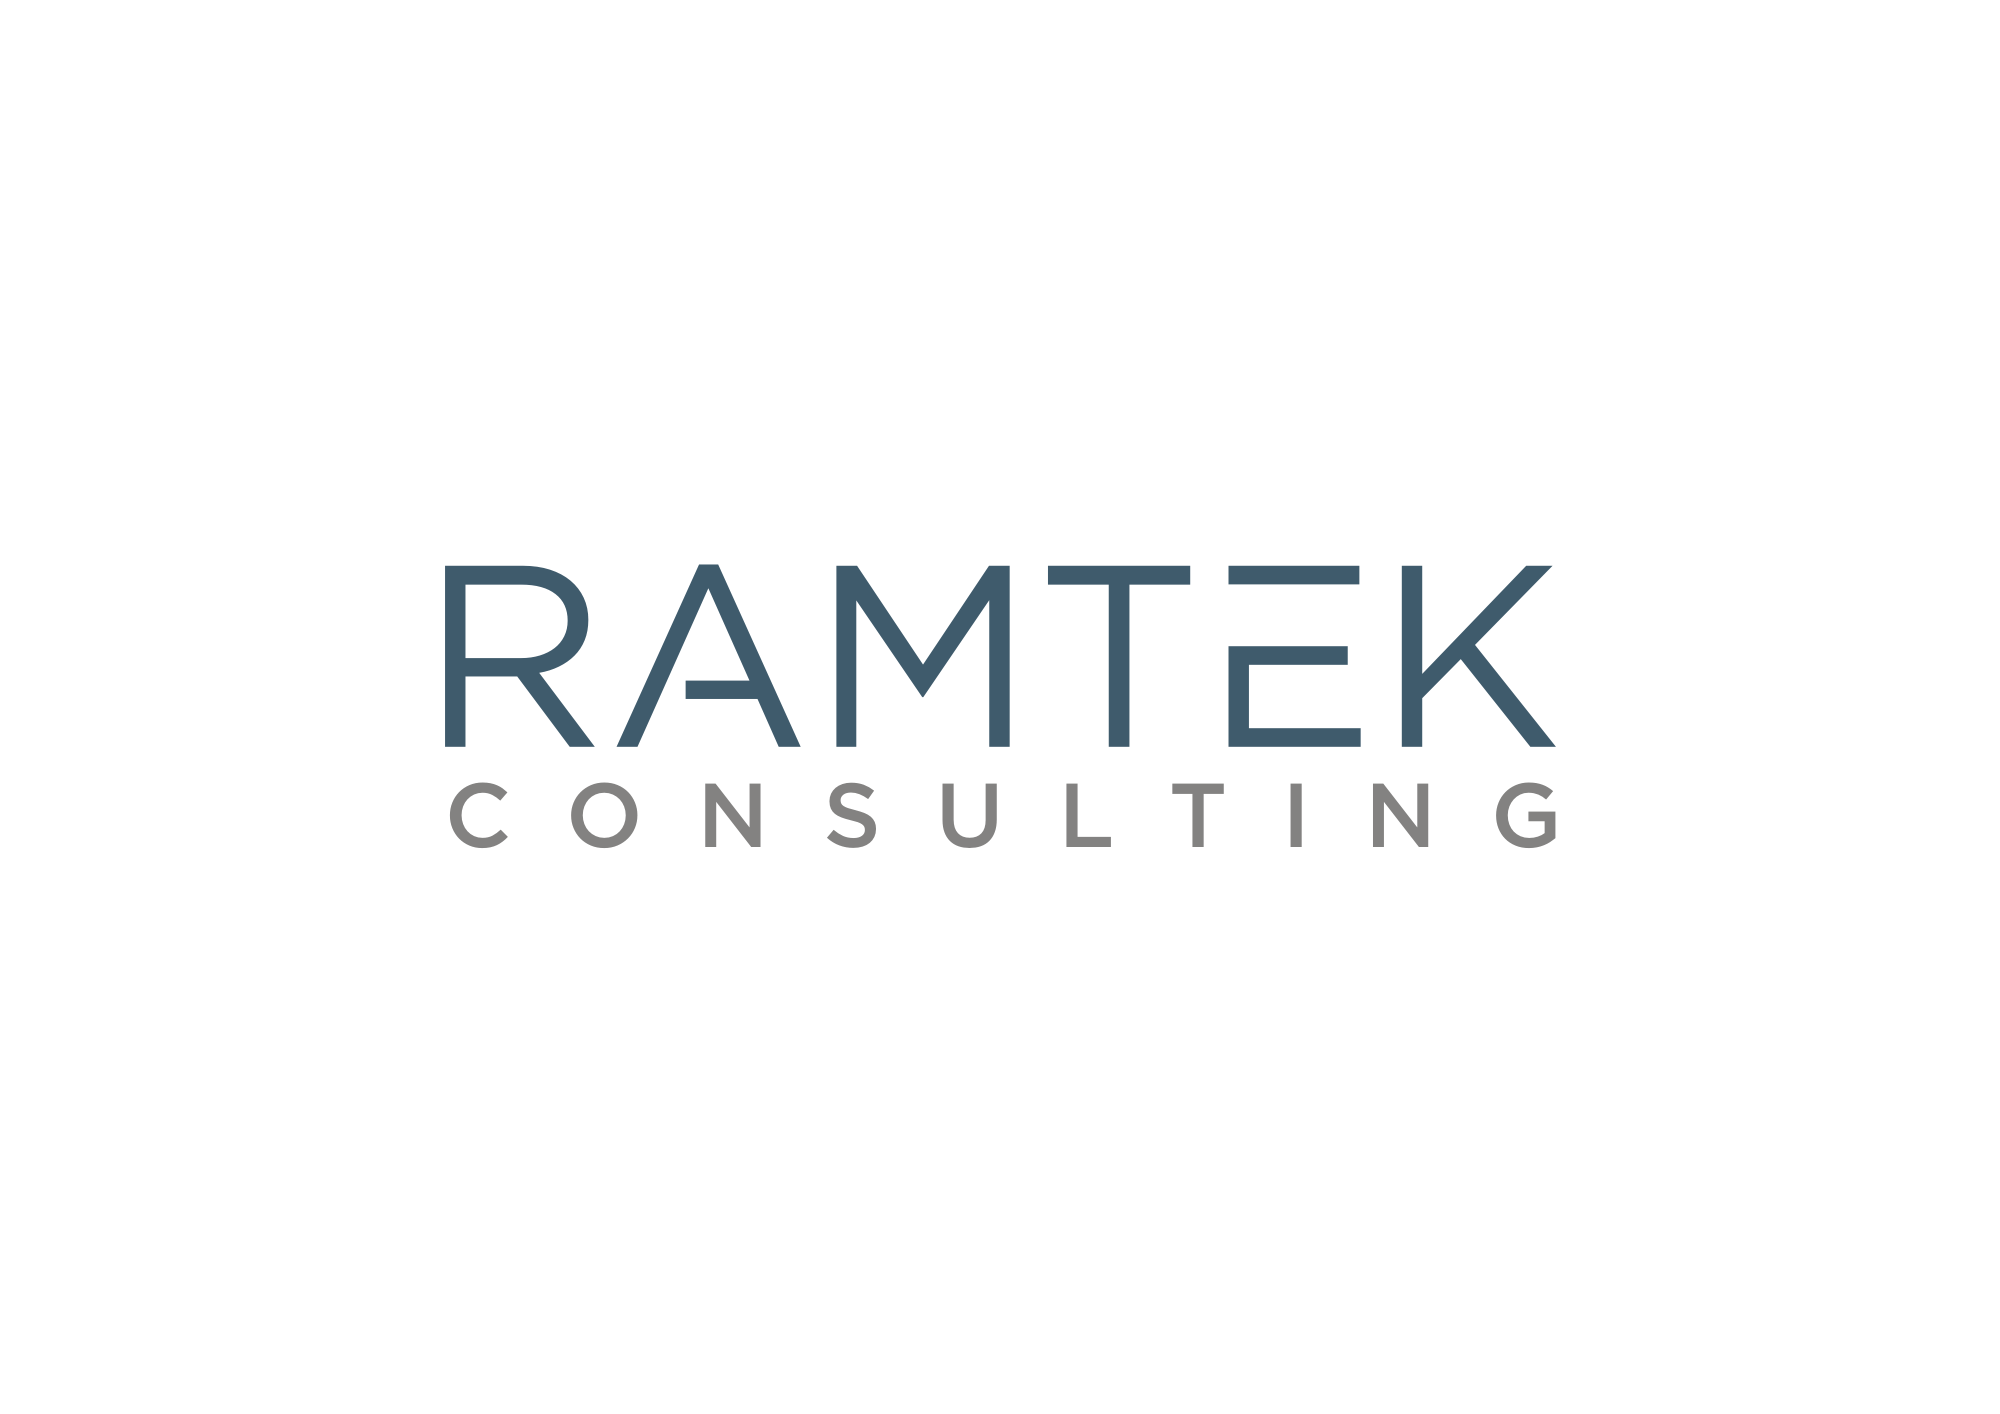 RamTEK Consulting